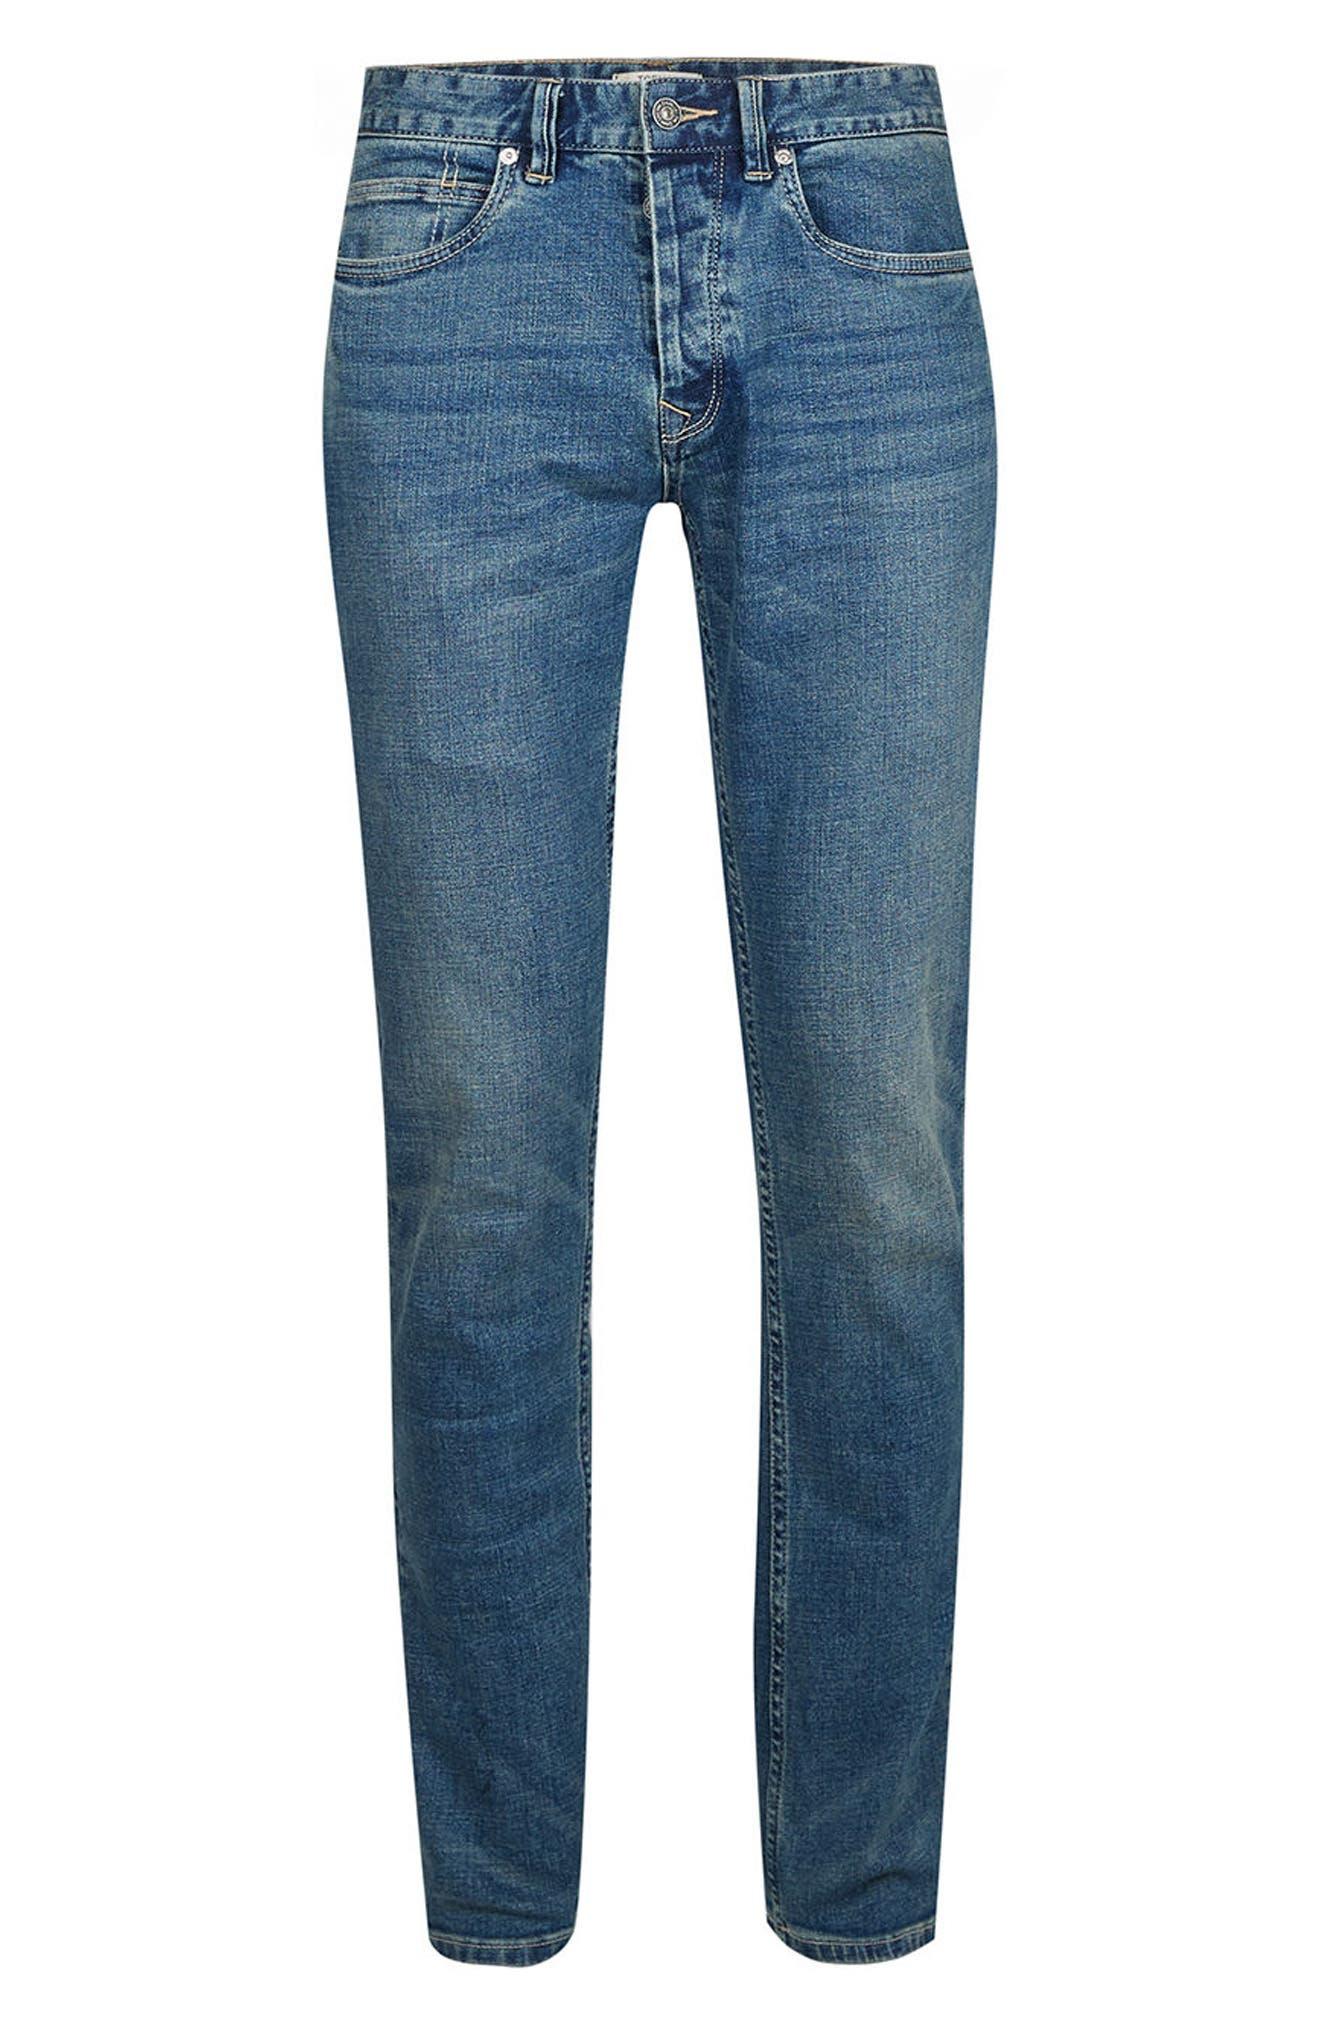 Stretch Slim Fit Jeans,                             Alternate thumbnail 4, color,